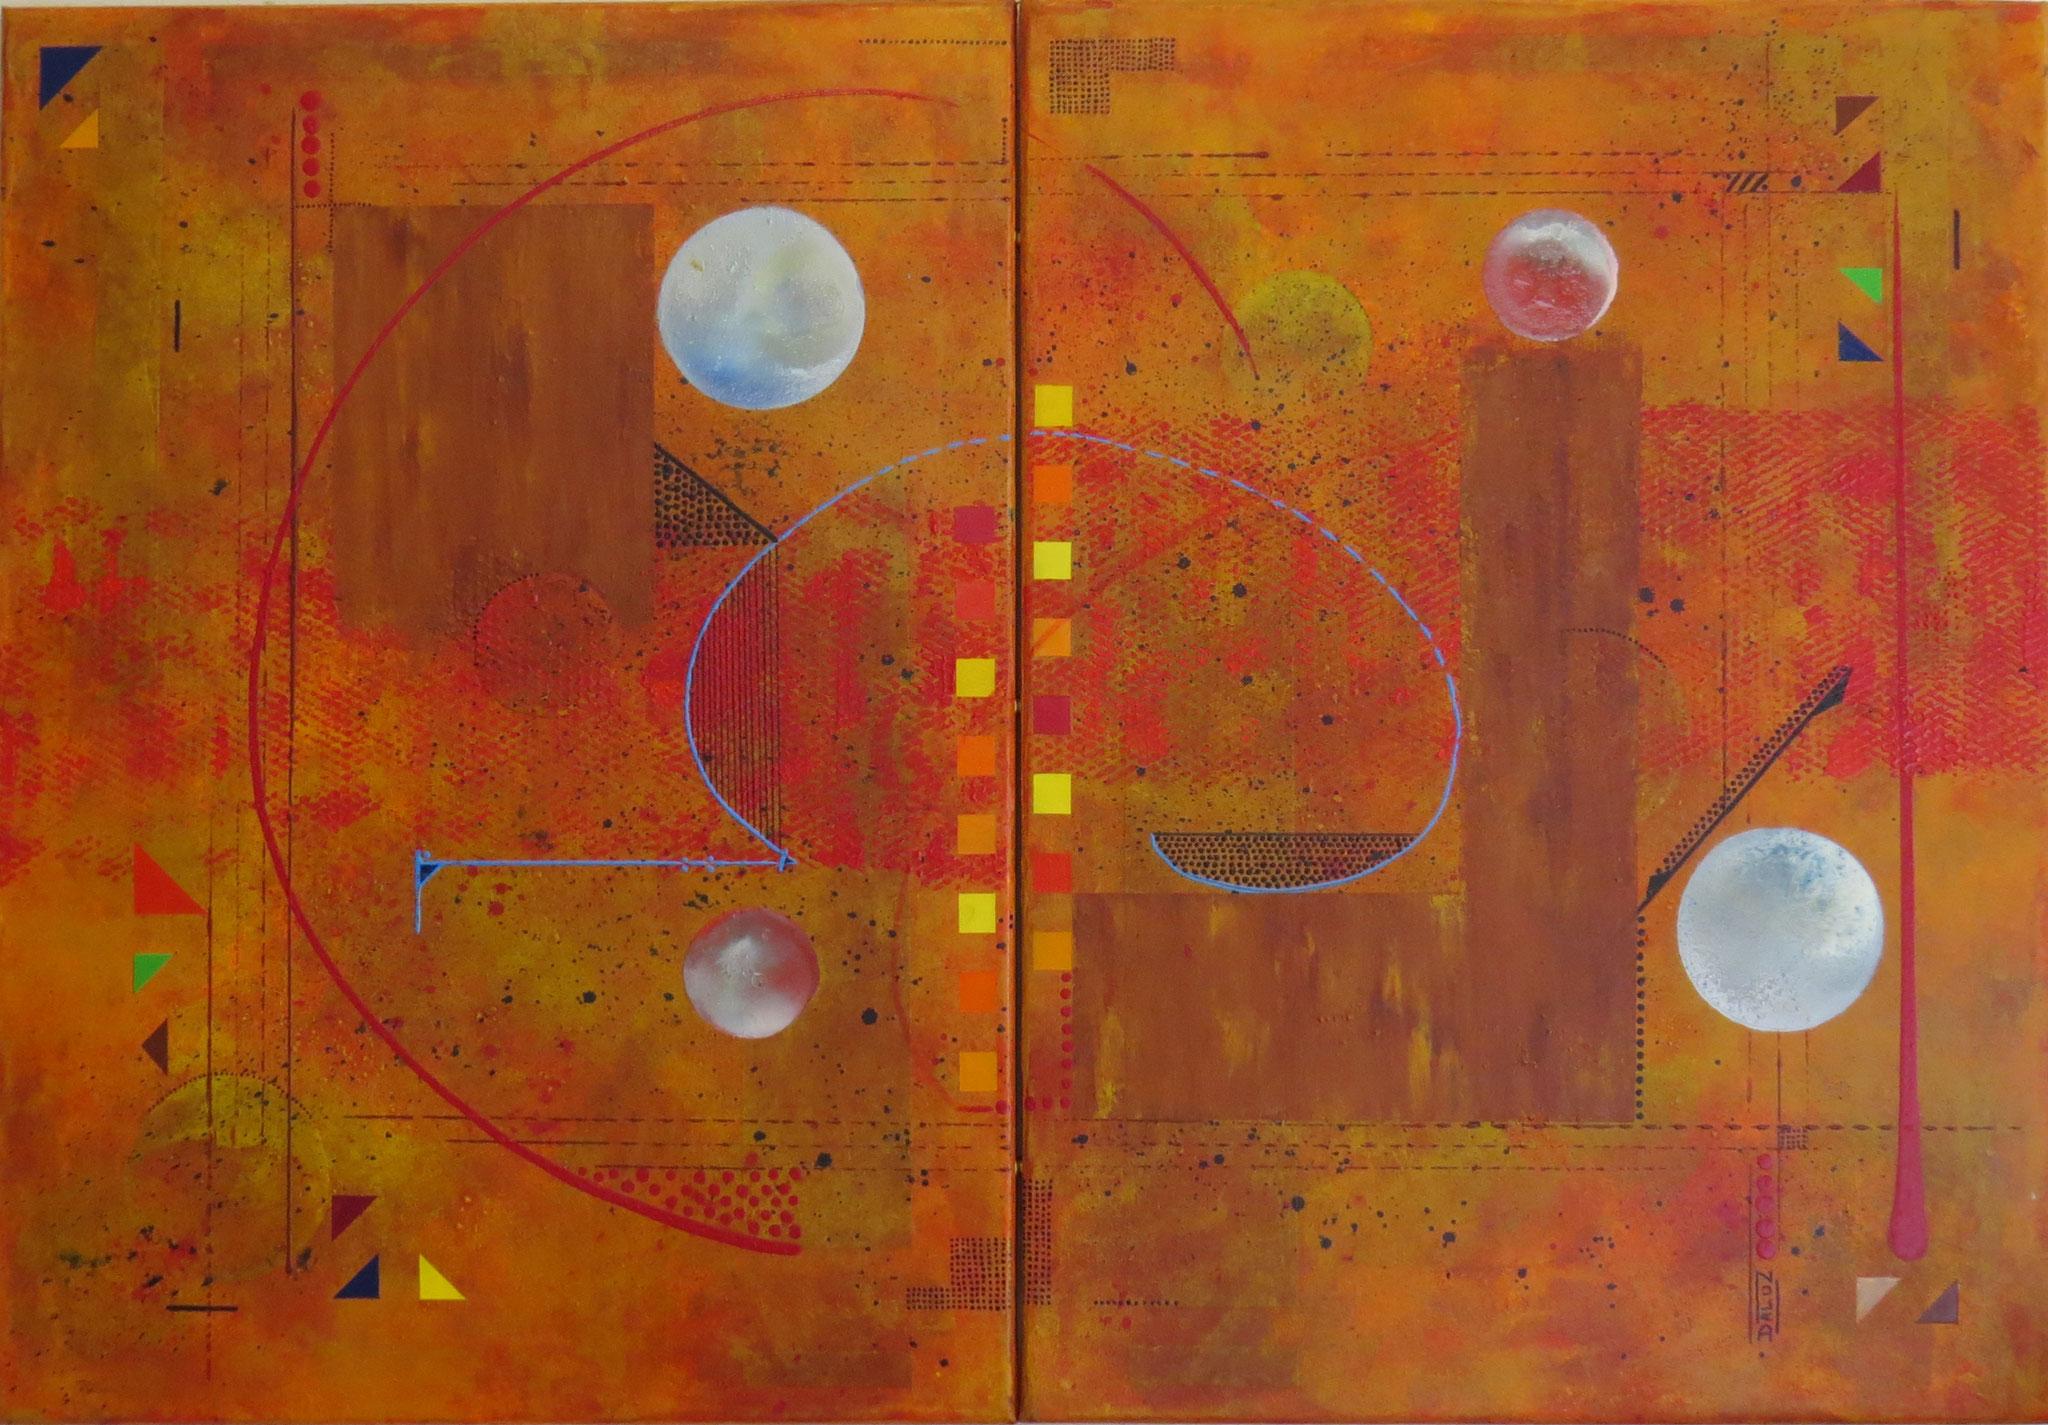 thêta - vue face1 - DALUZ GALEGO - peinture abstraite